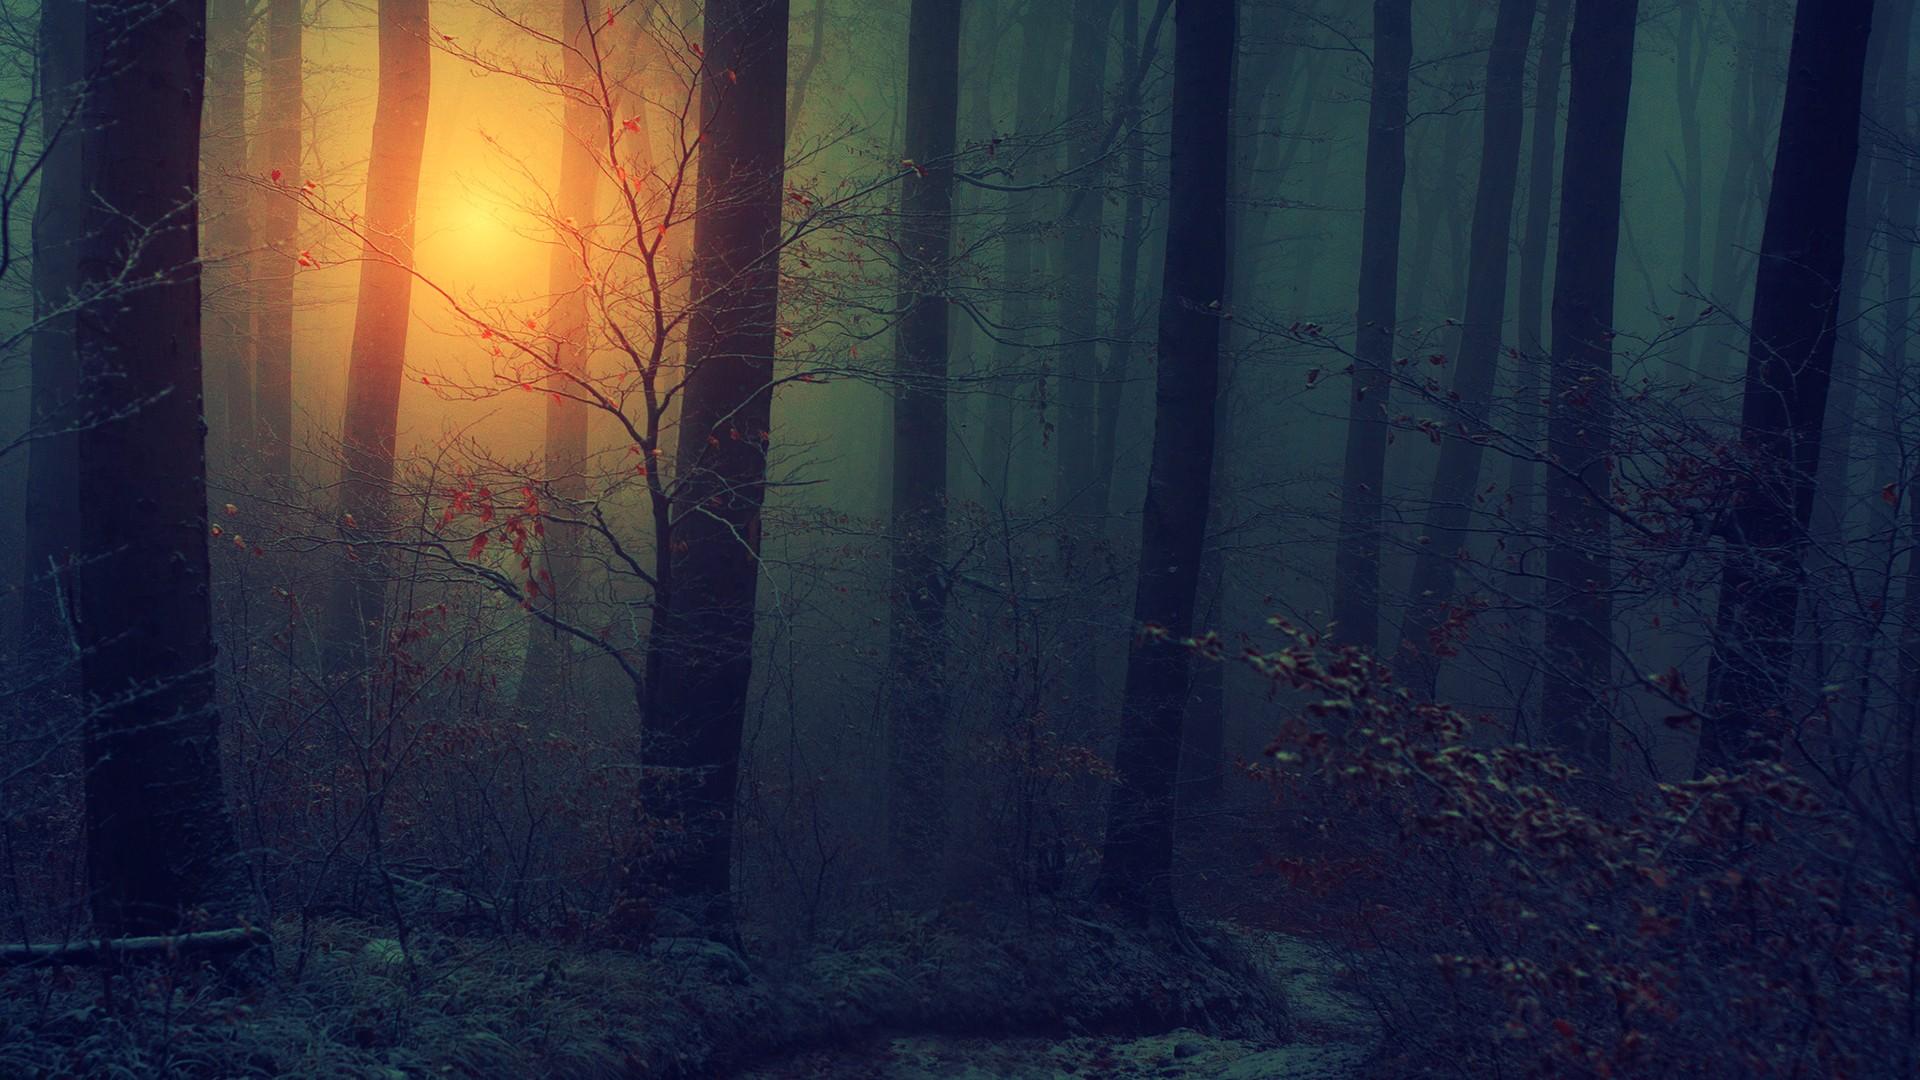 Wallpaper 1920x1080 Px Autumn Bark Dark Fall Floor Fog Forests Haze Landscapes Leaves Mist Mood Nature Seasons Spooky Sun Sunlight Sunrise Sunset Trees Wood 1920x1080 Wallbase 1719621 Hd Wallpapers Wallhere